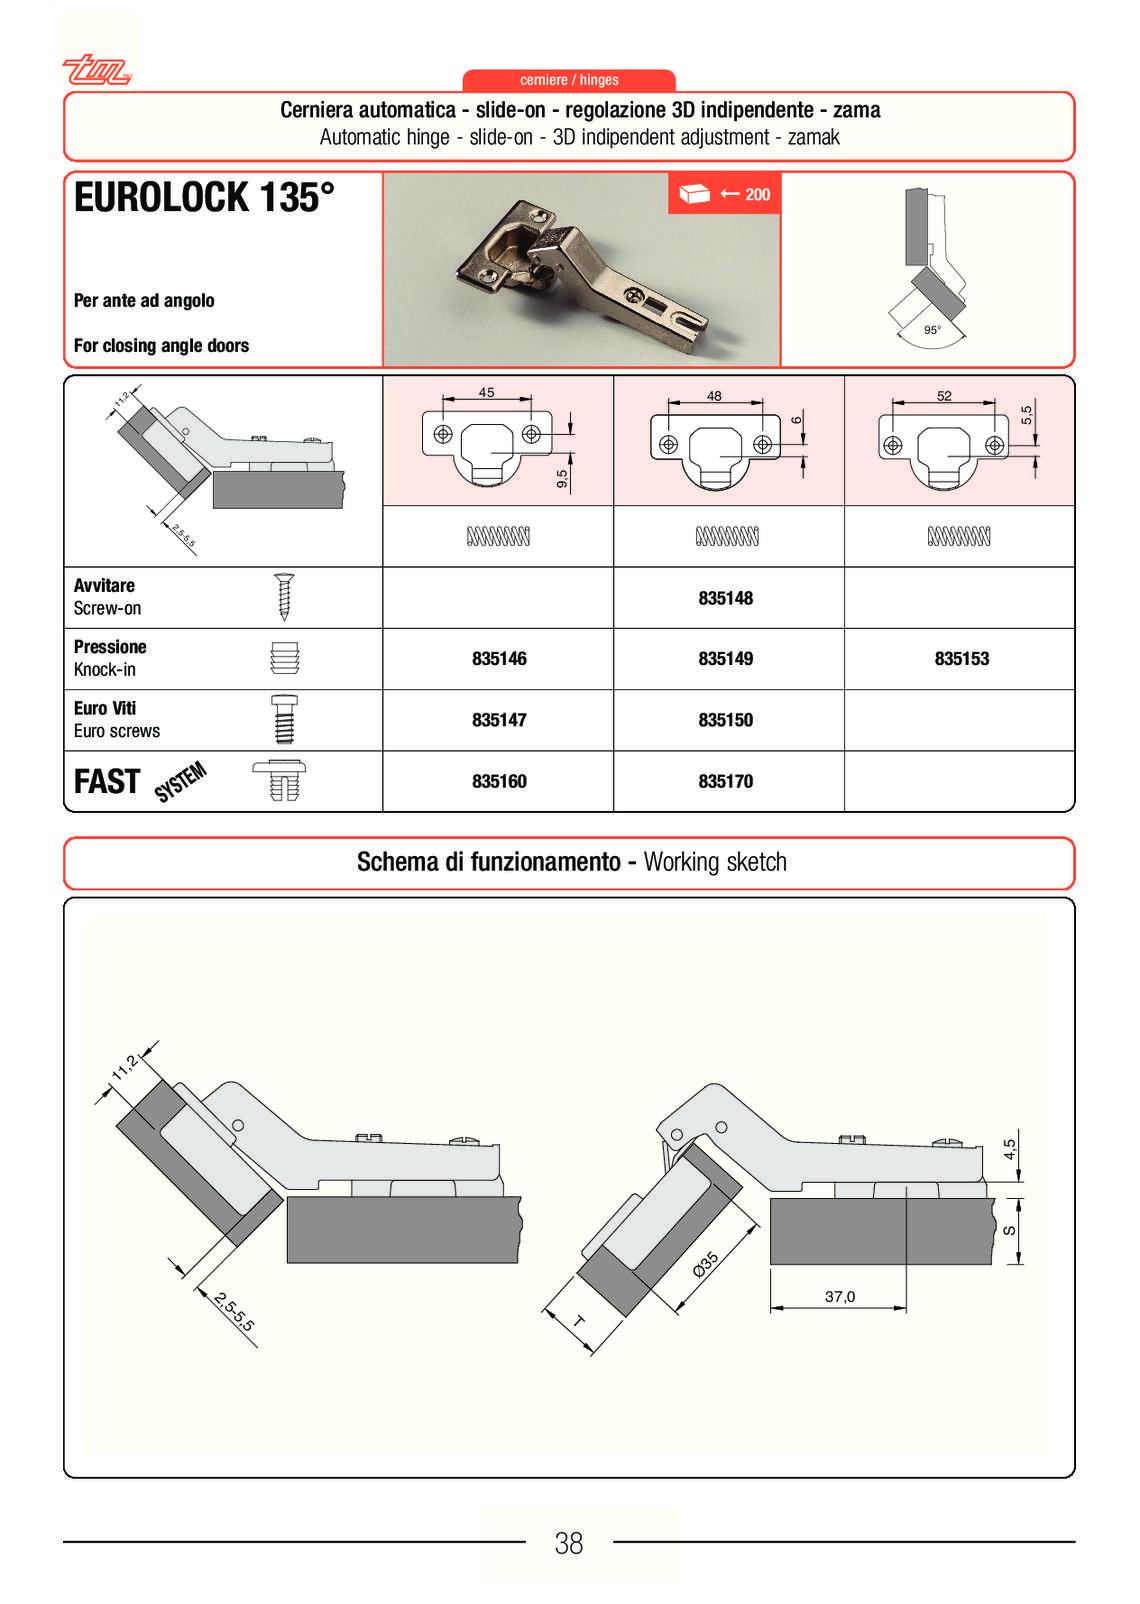 euro-hinges-catalogue_175_037.jpg